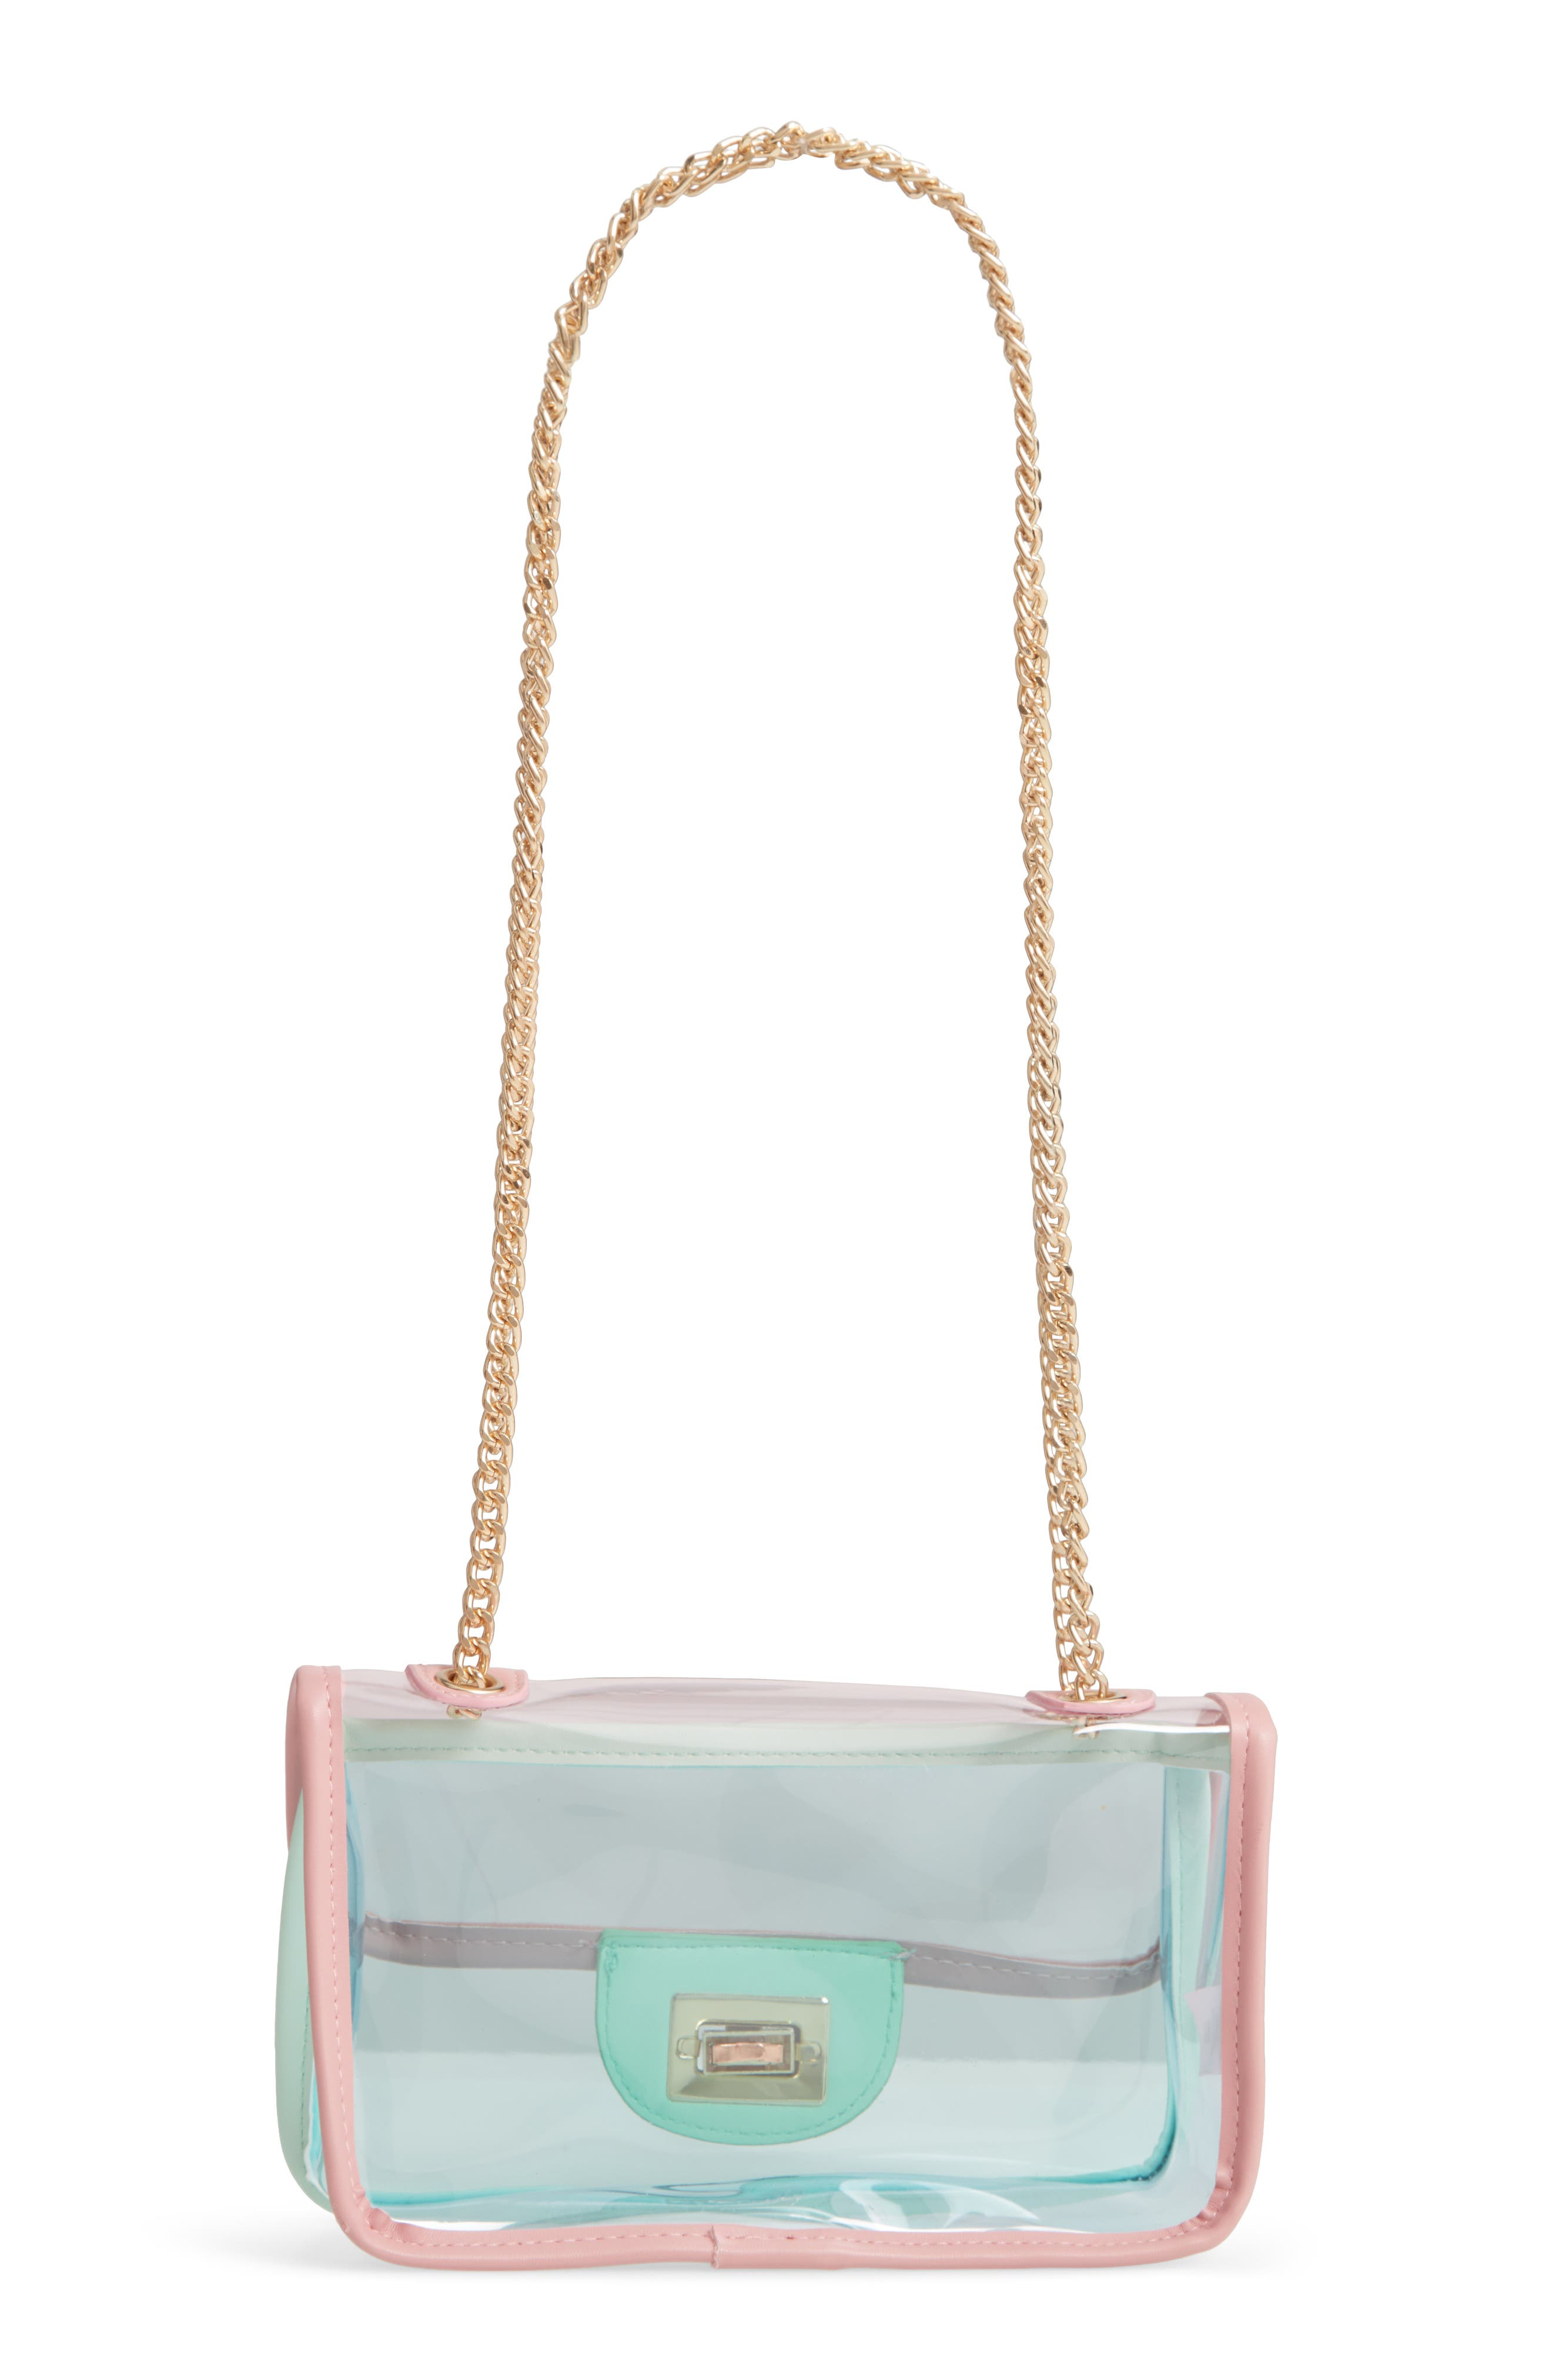 JANE & BERRY, Transparent Crossbody Bag, Alternate thumbnail 5, color, PINK MULTI